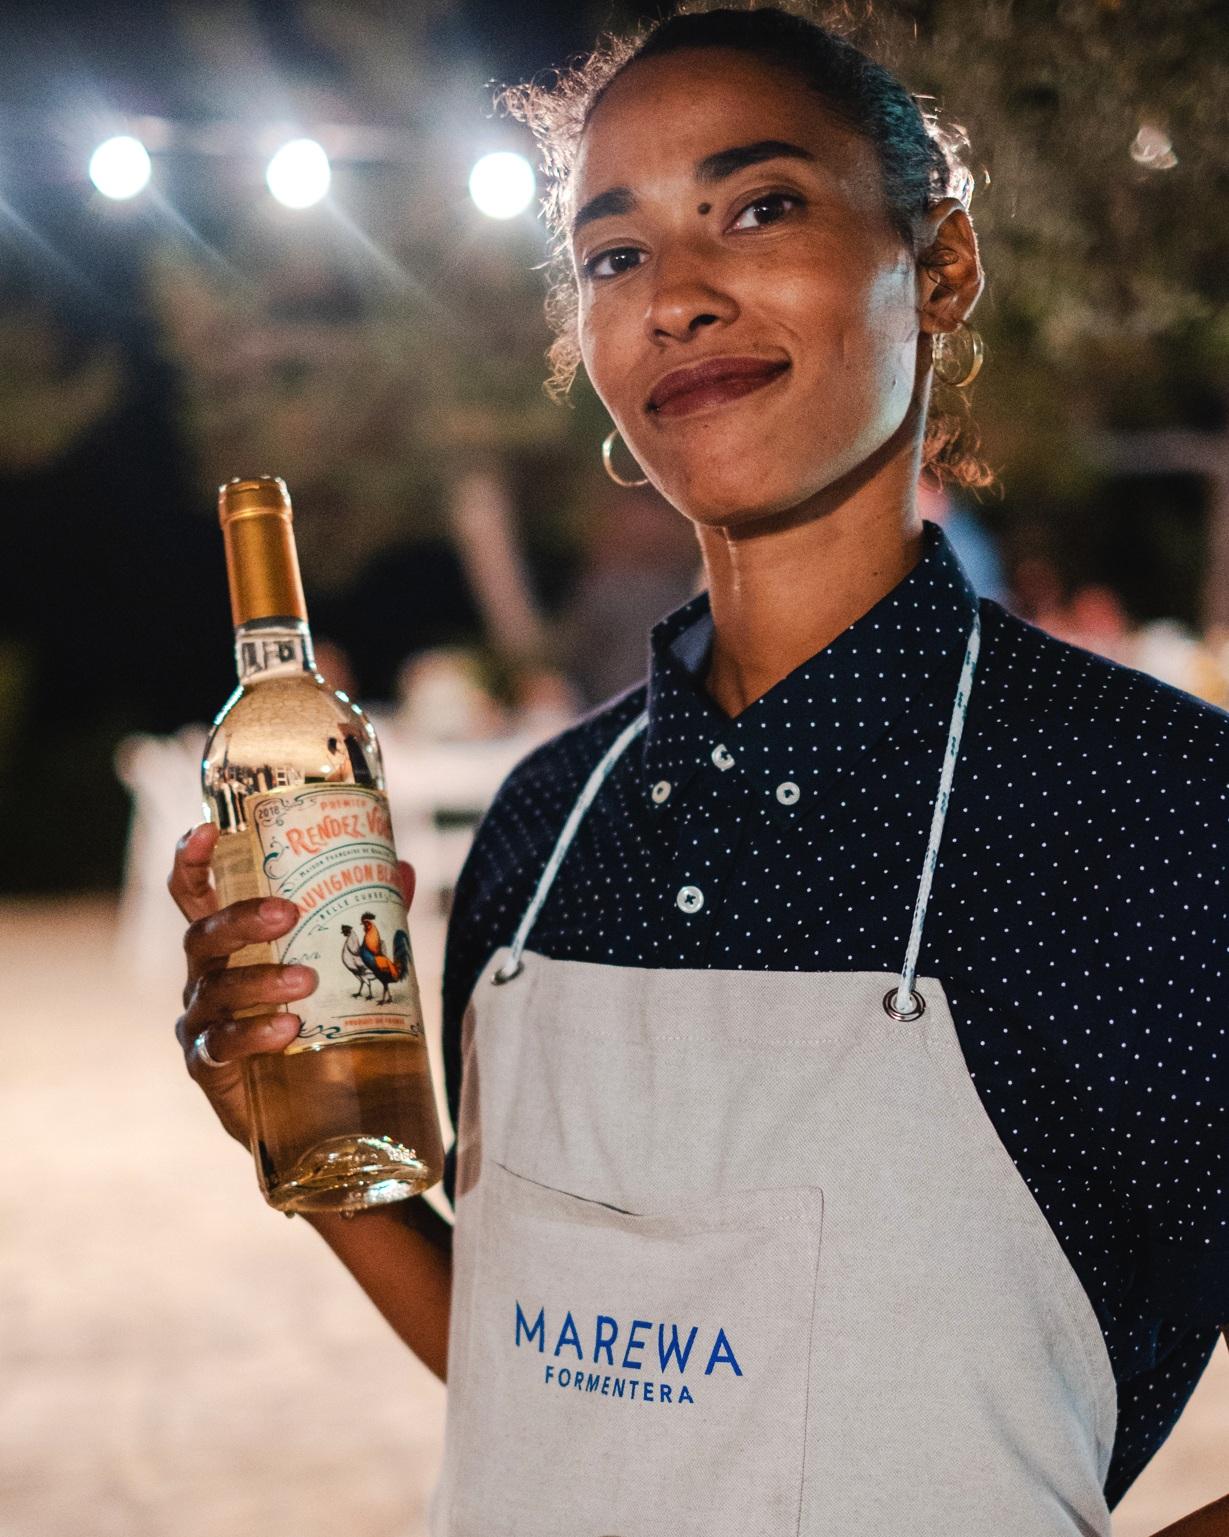 wine marewa formentera.jpg